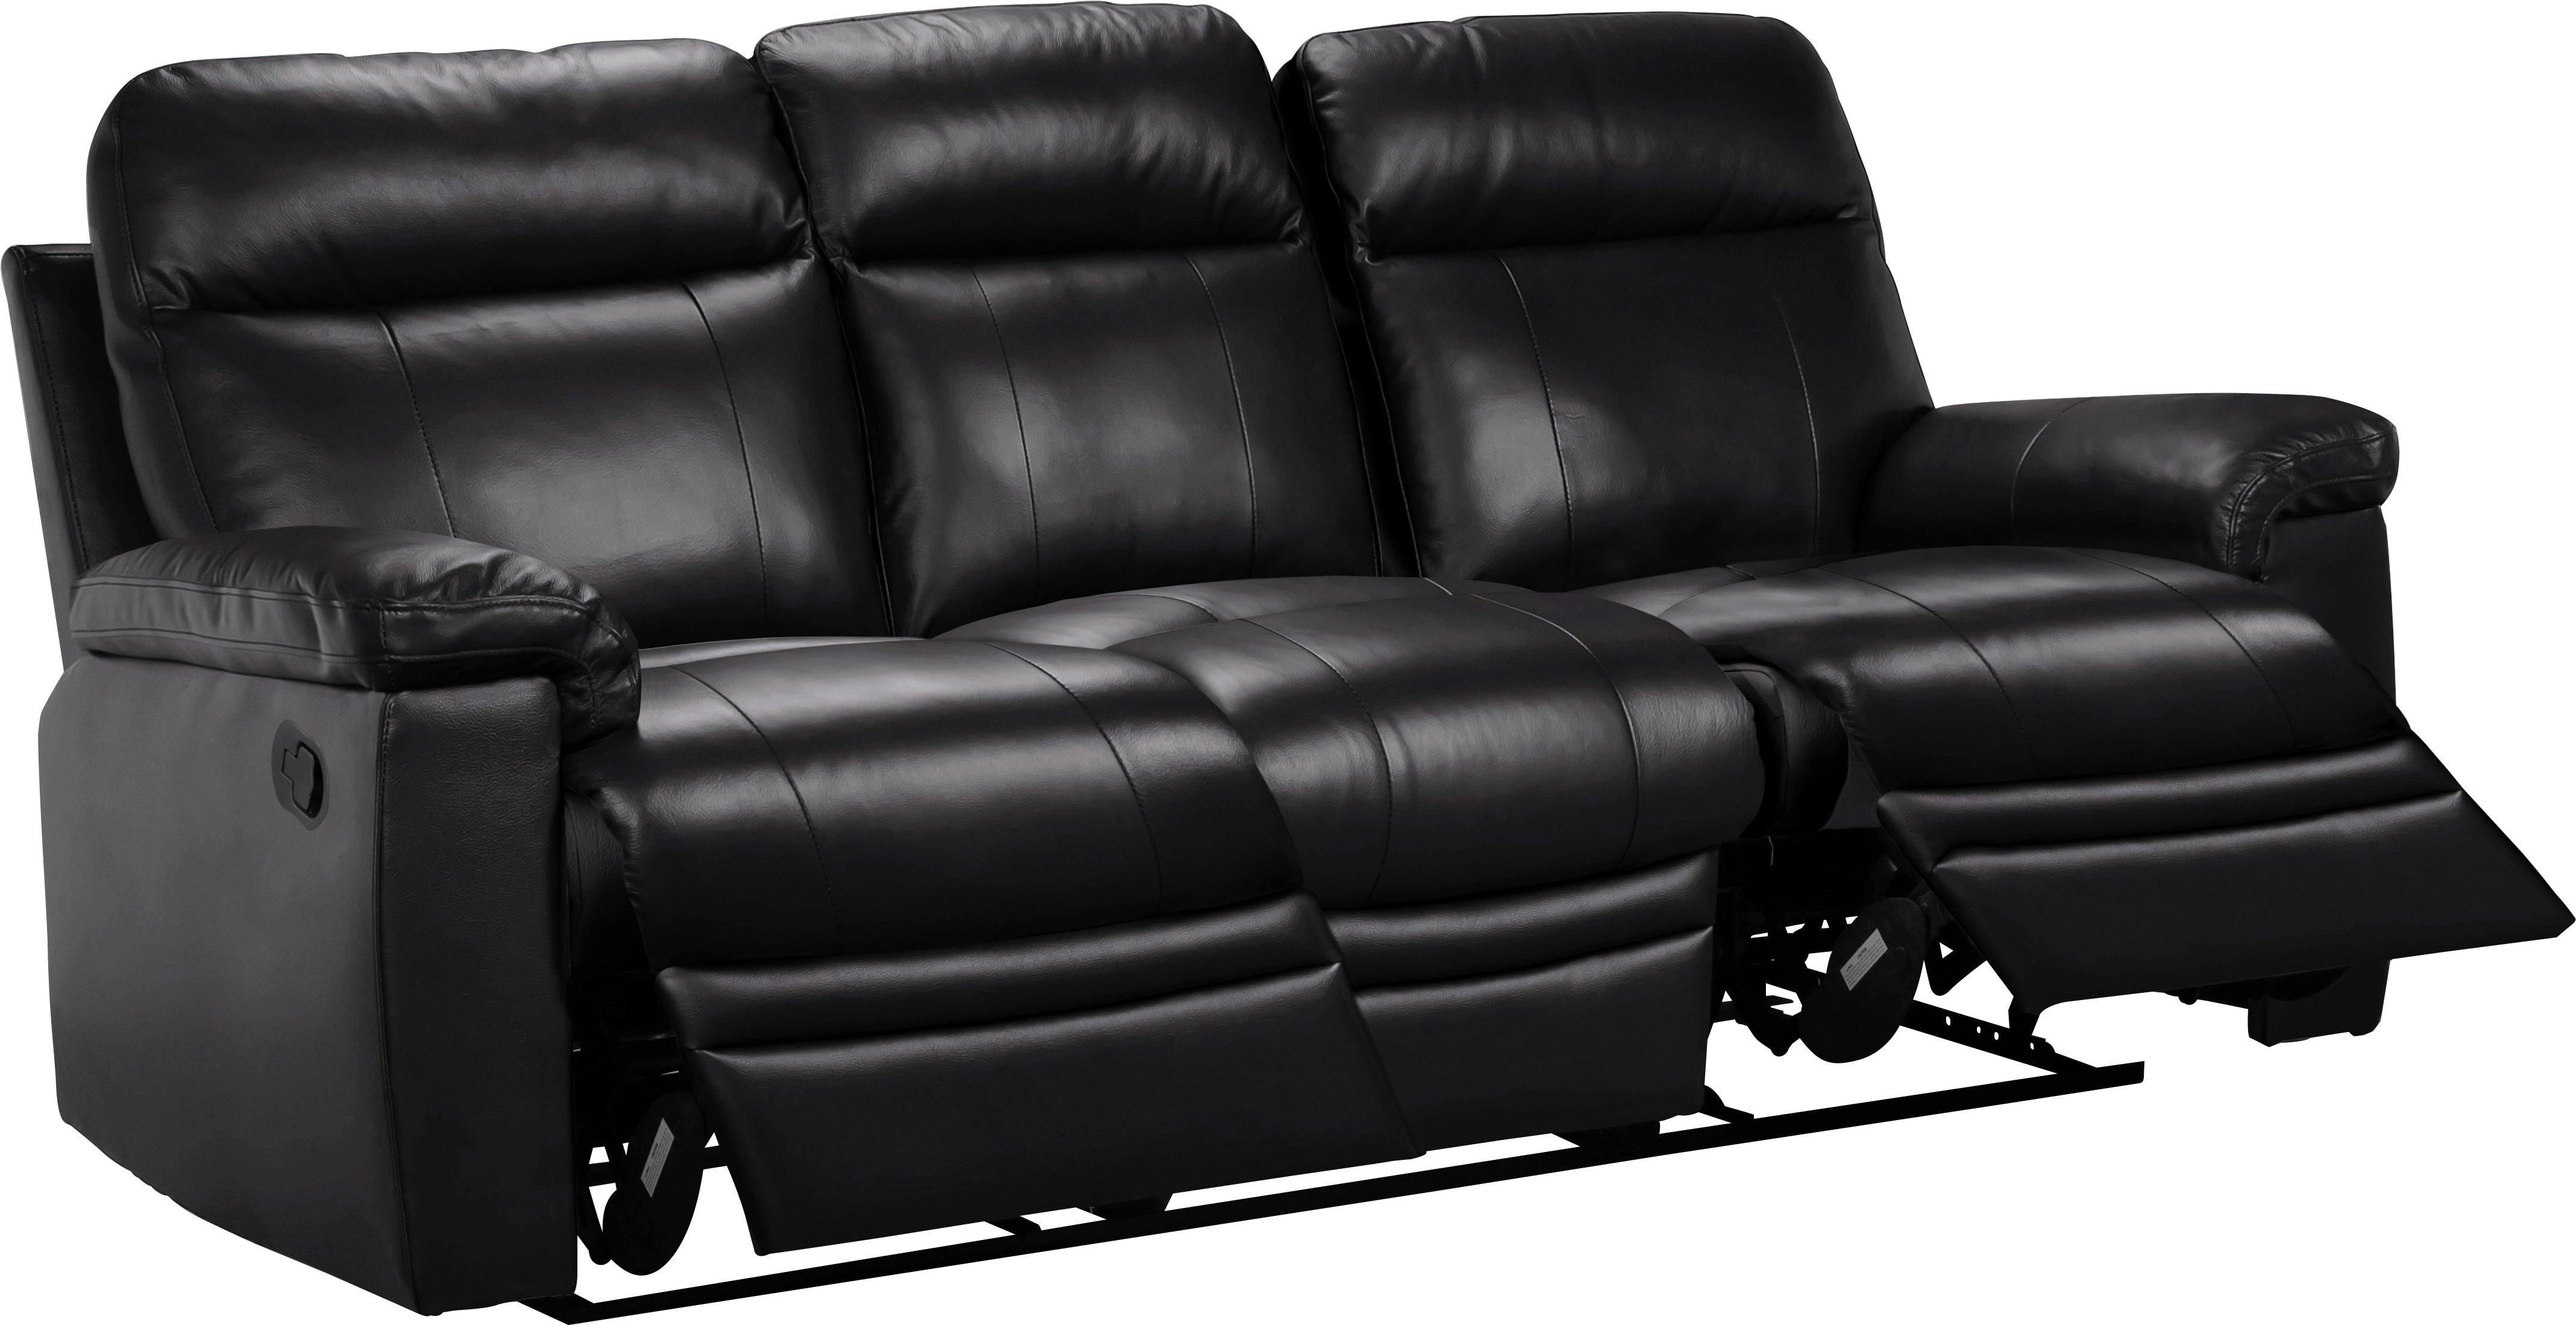 Argos Home Bruno 3 Seat Leather Eff Manual Recliner Sofa